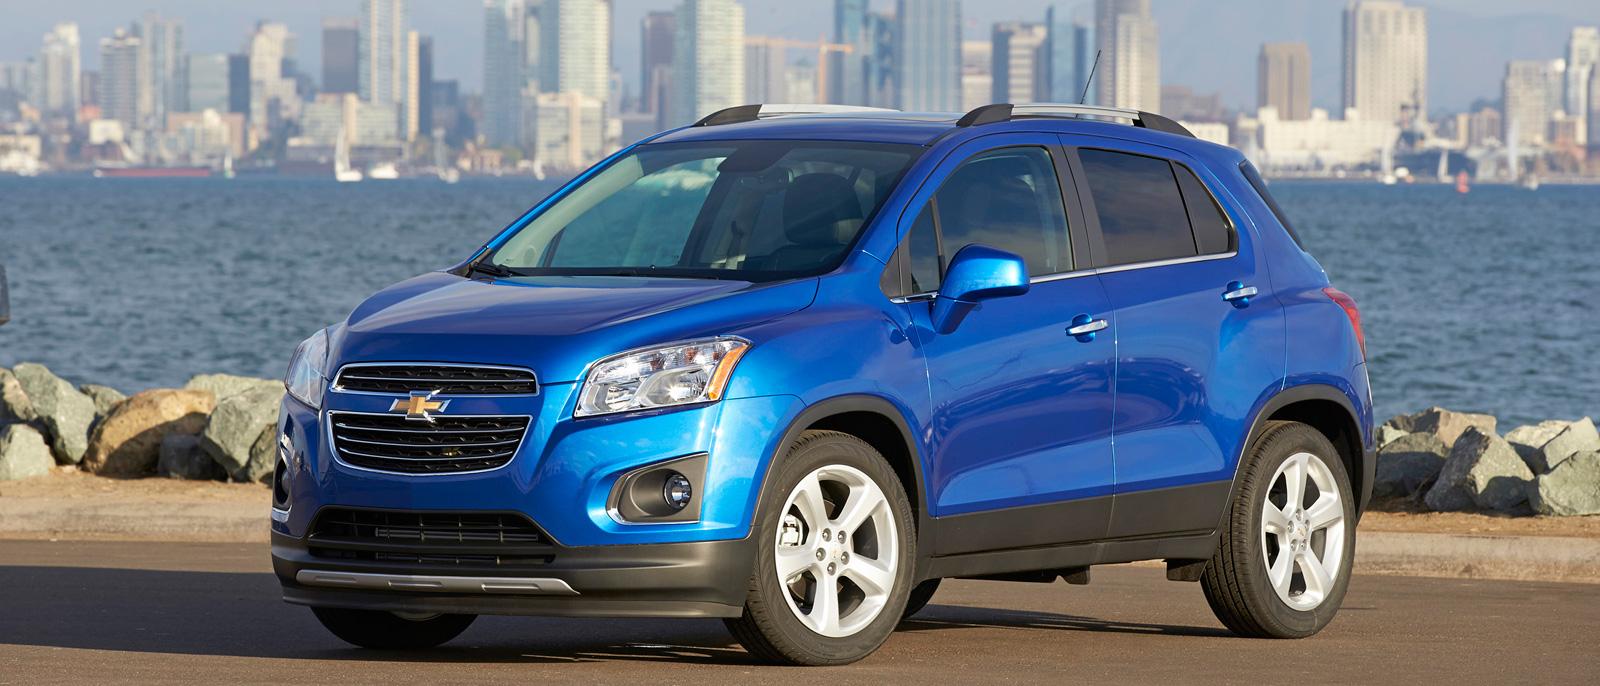 Carbone subaru new subaru used car dealership troy ny for Carbone honda bennington vt